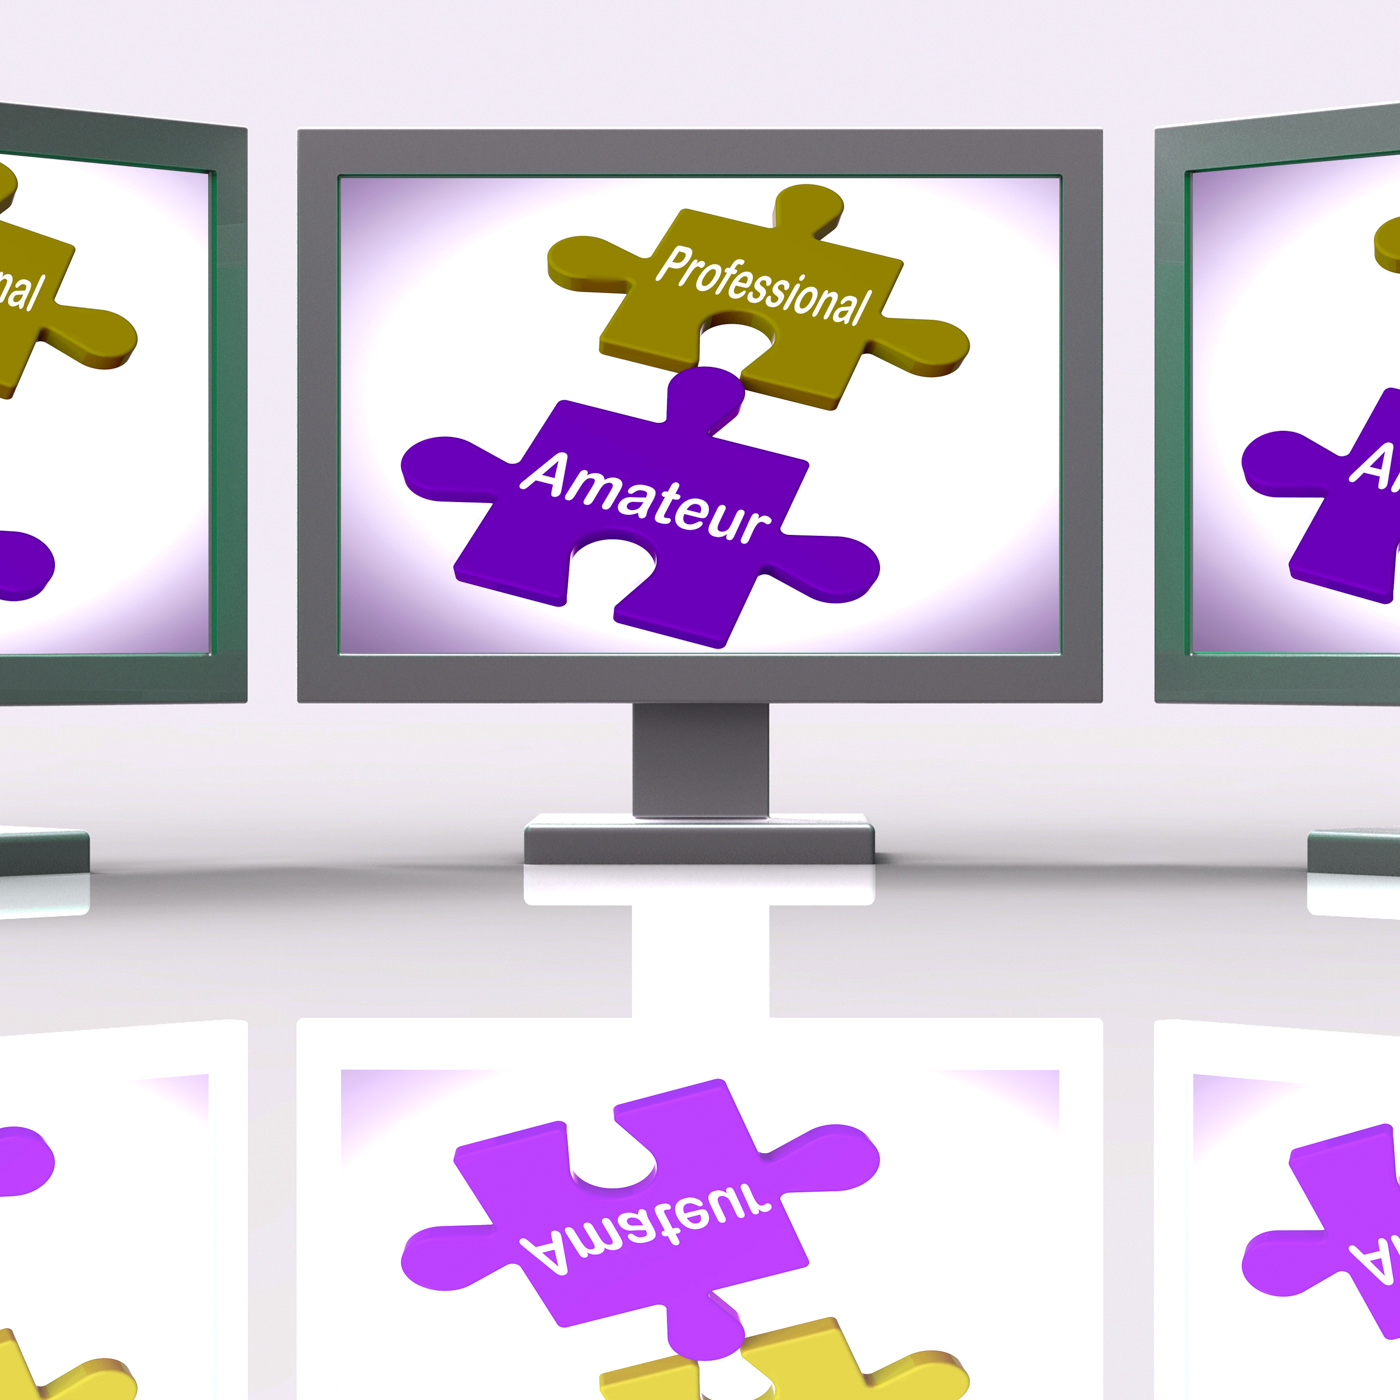 Professional amateur puzzle online shows expert and apprentice photo